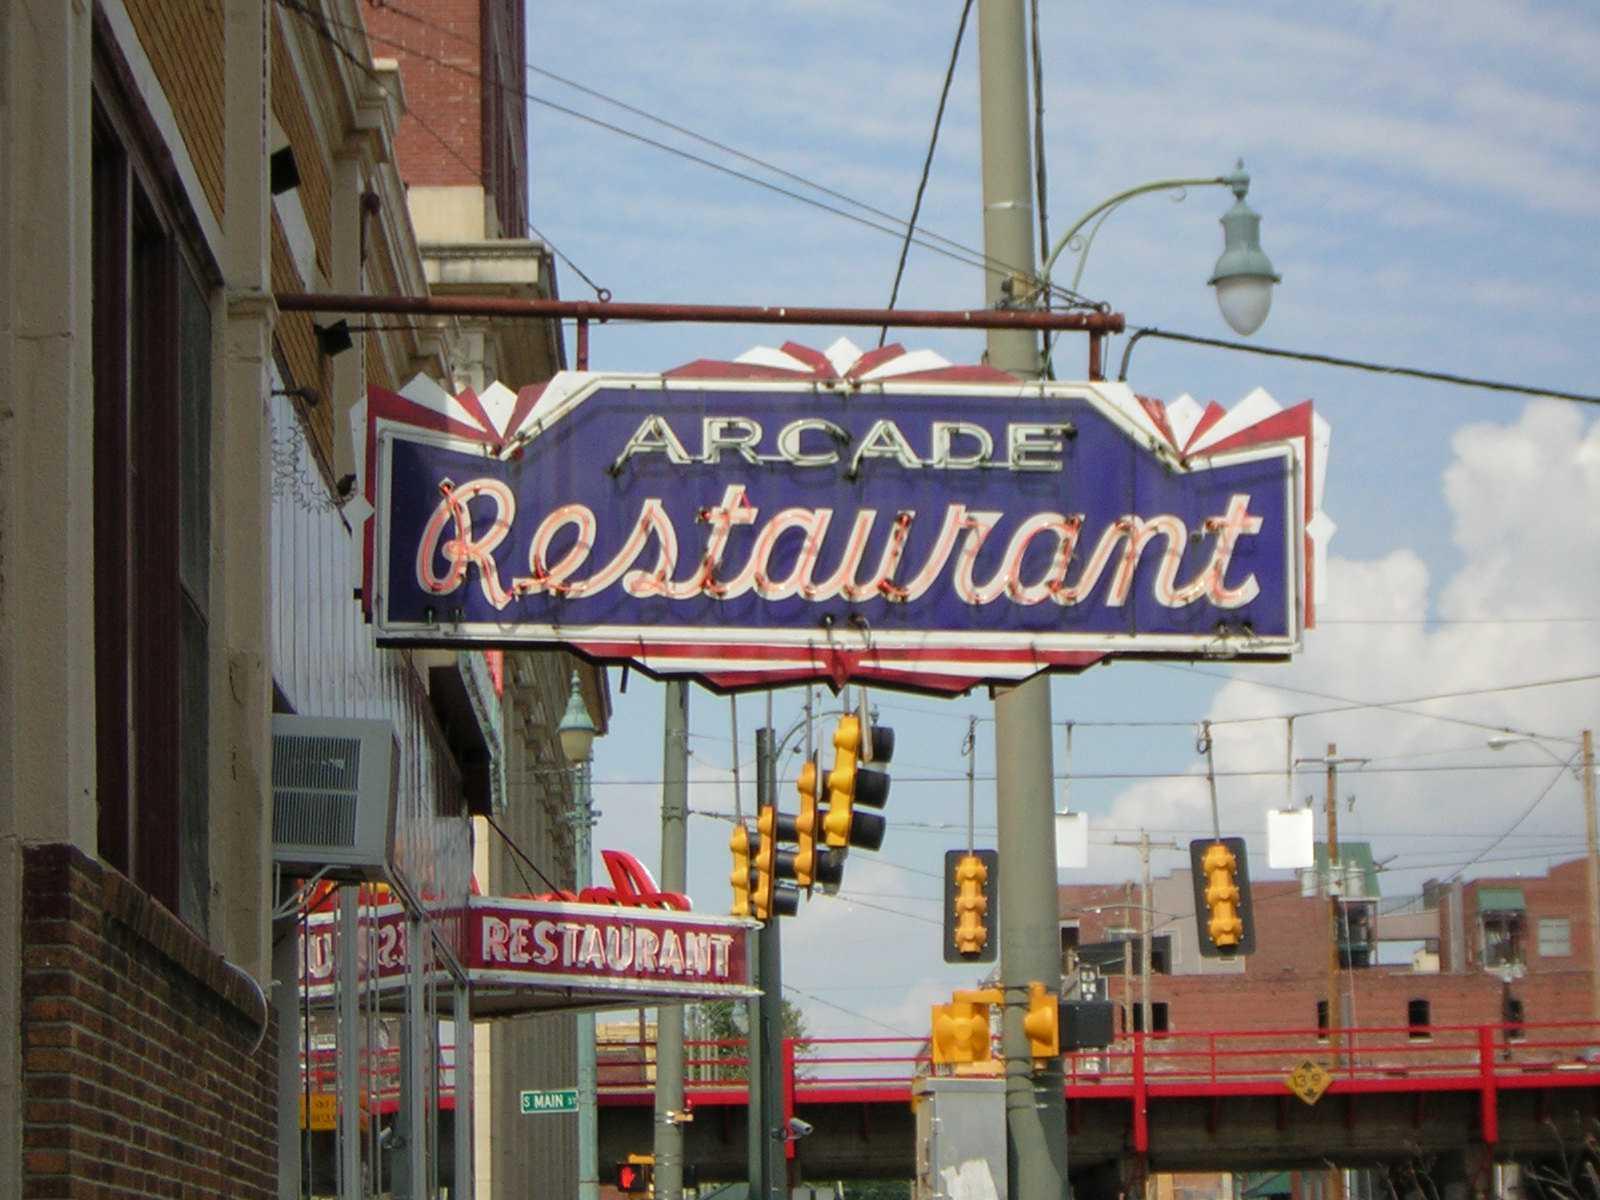 Sign for Arcade Restaurant